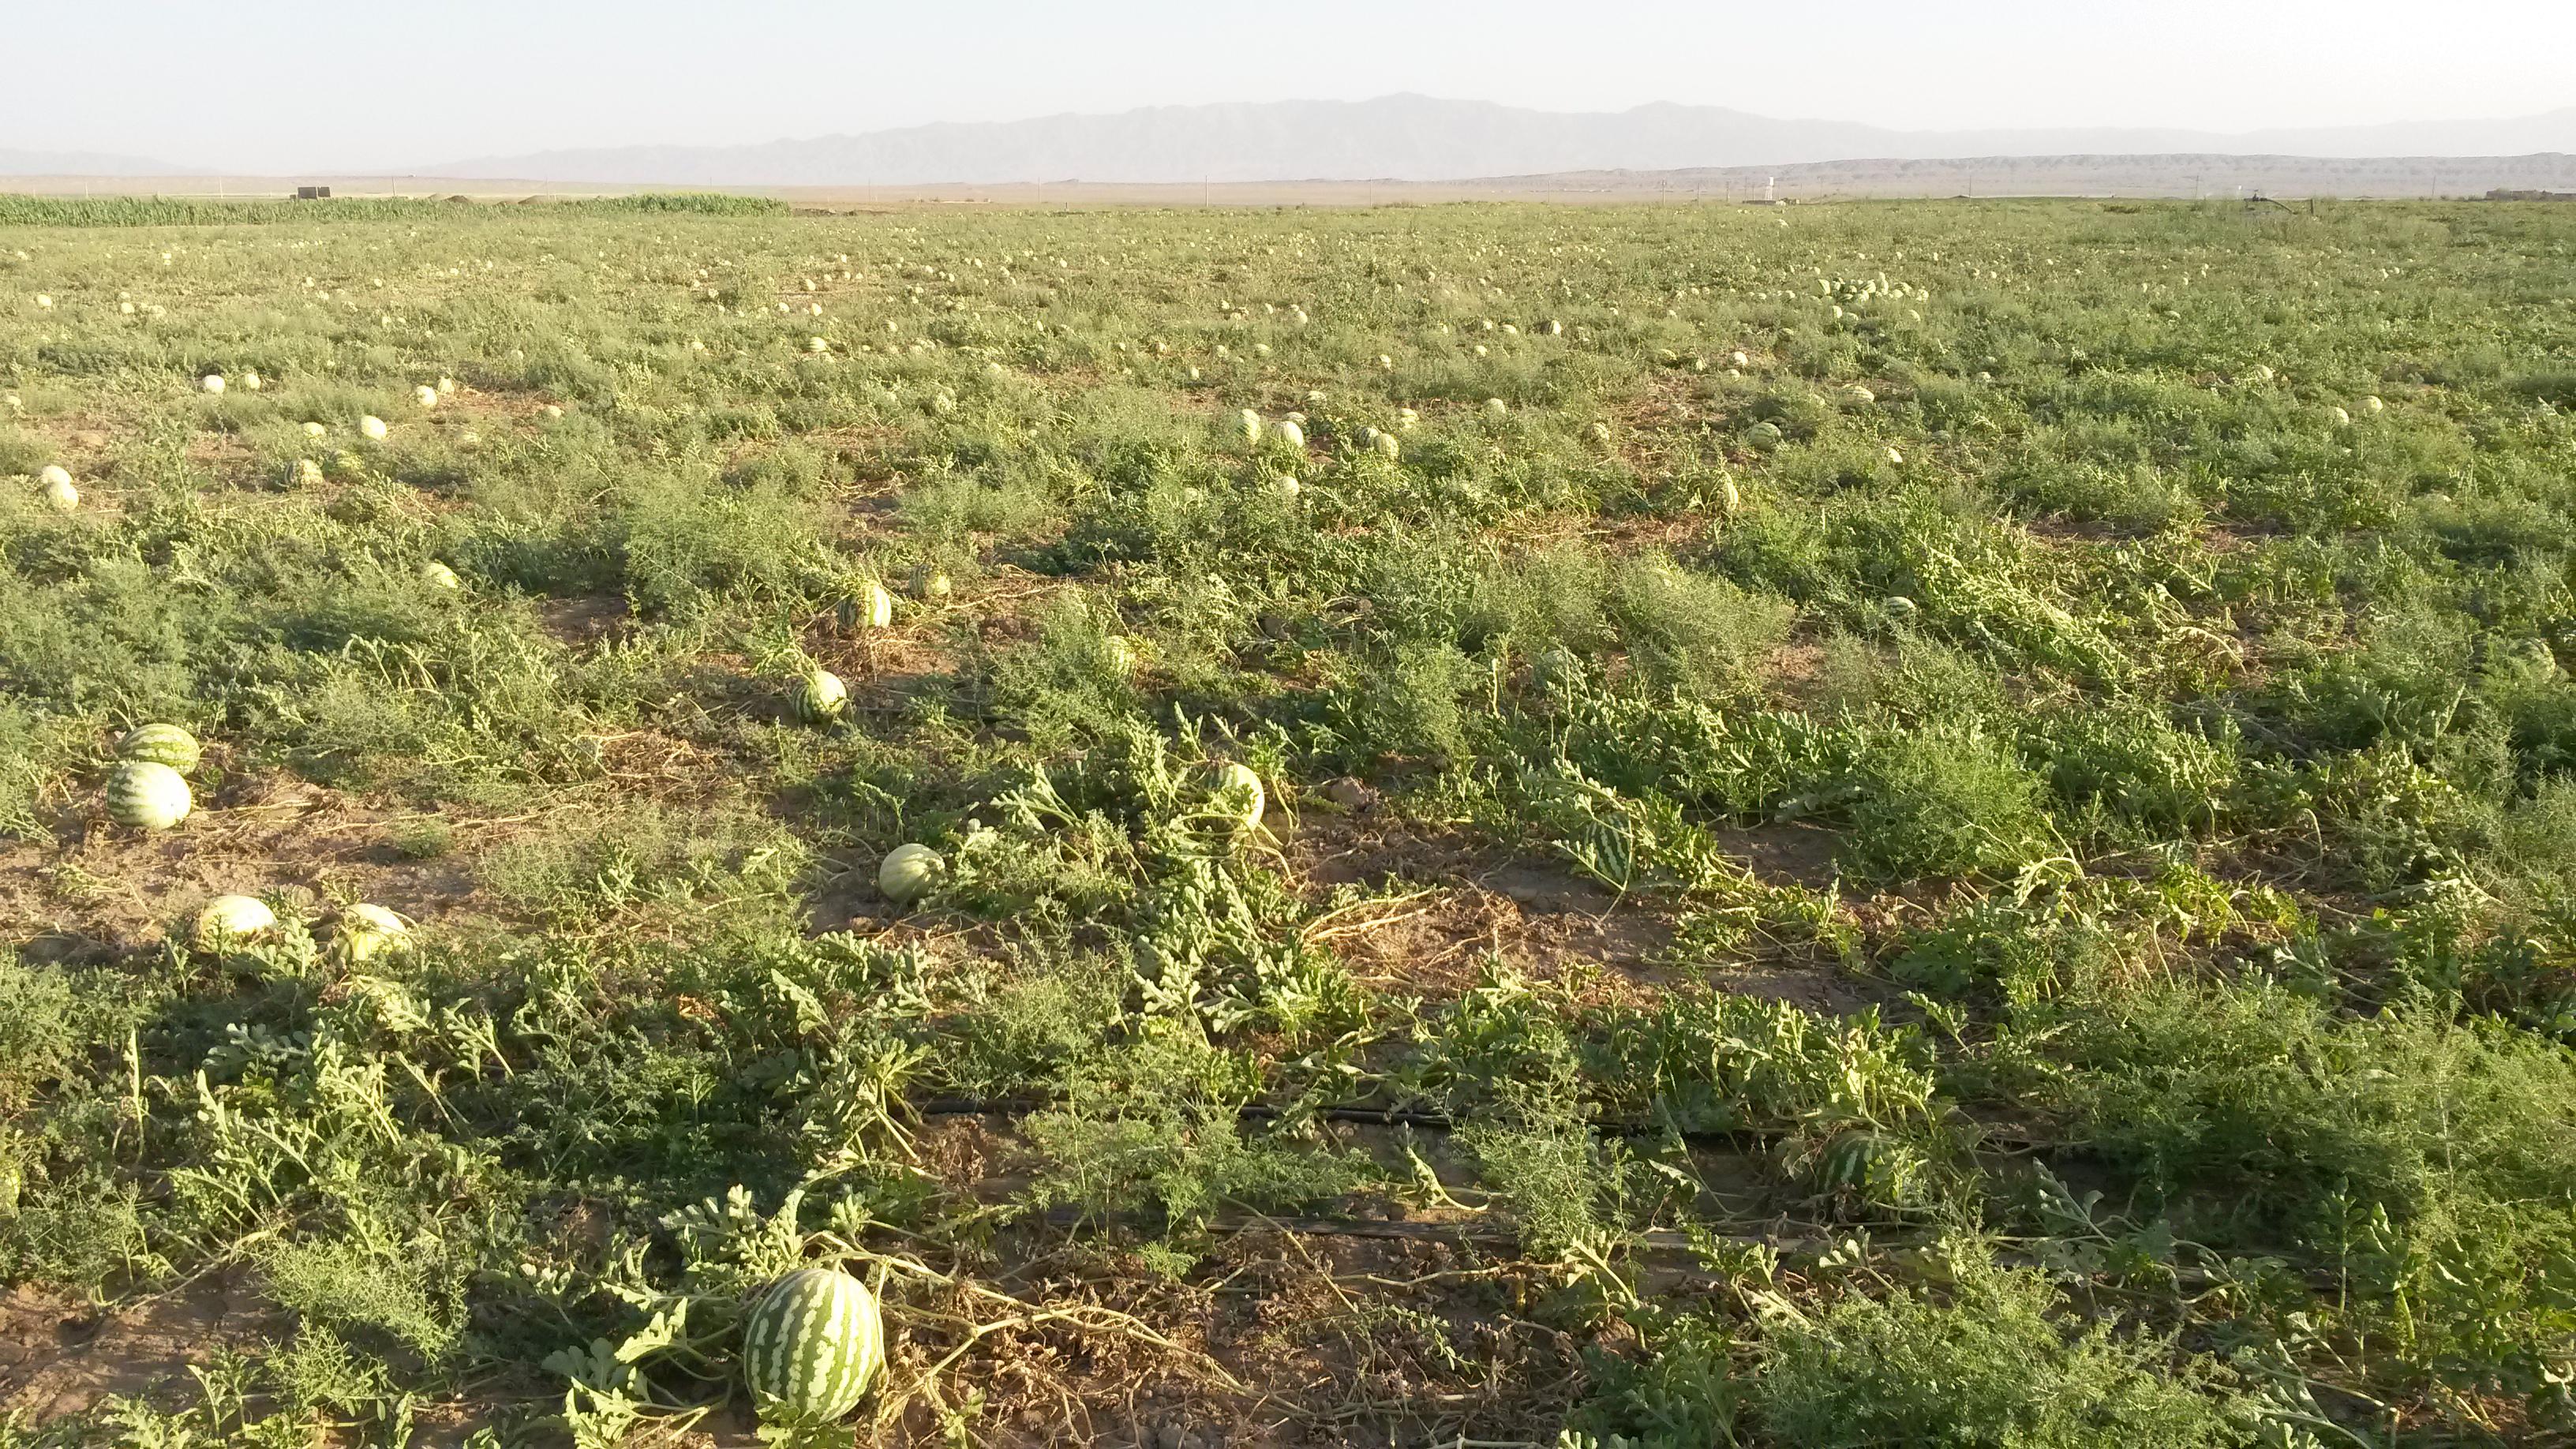 Melón vodový (Citrullus vulgaris) na poli